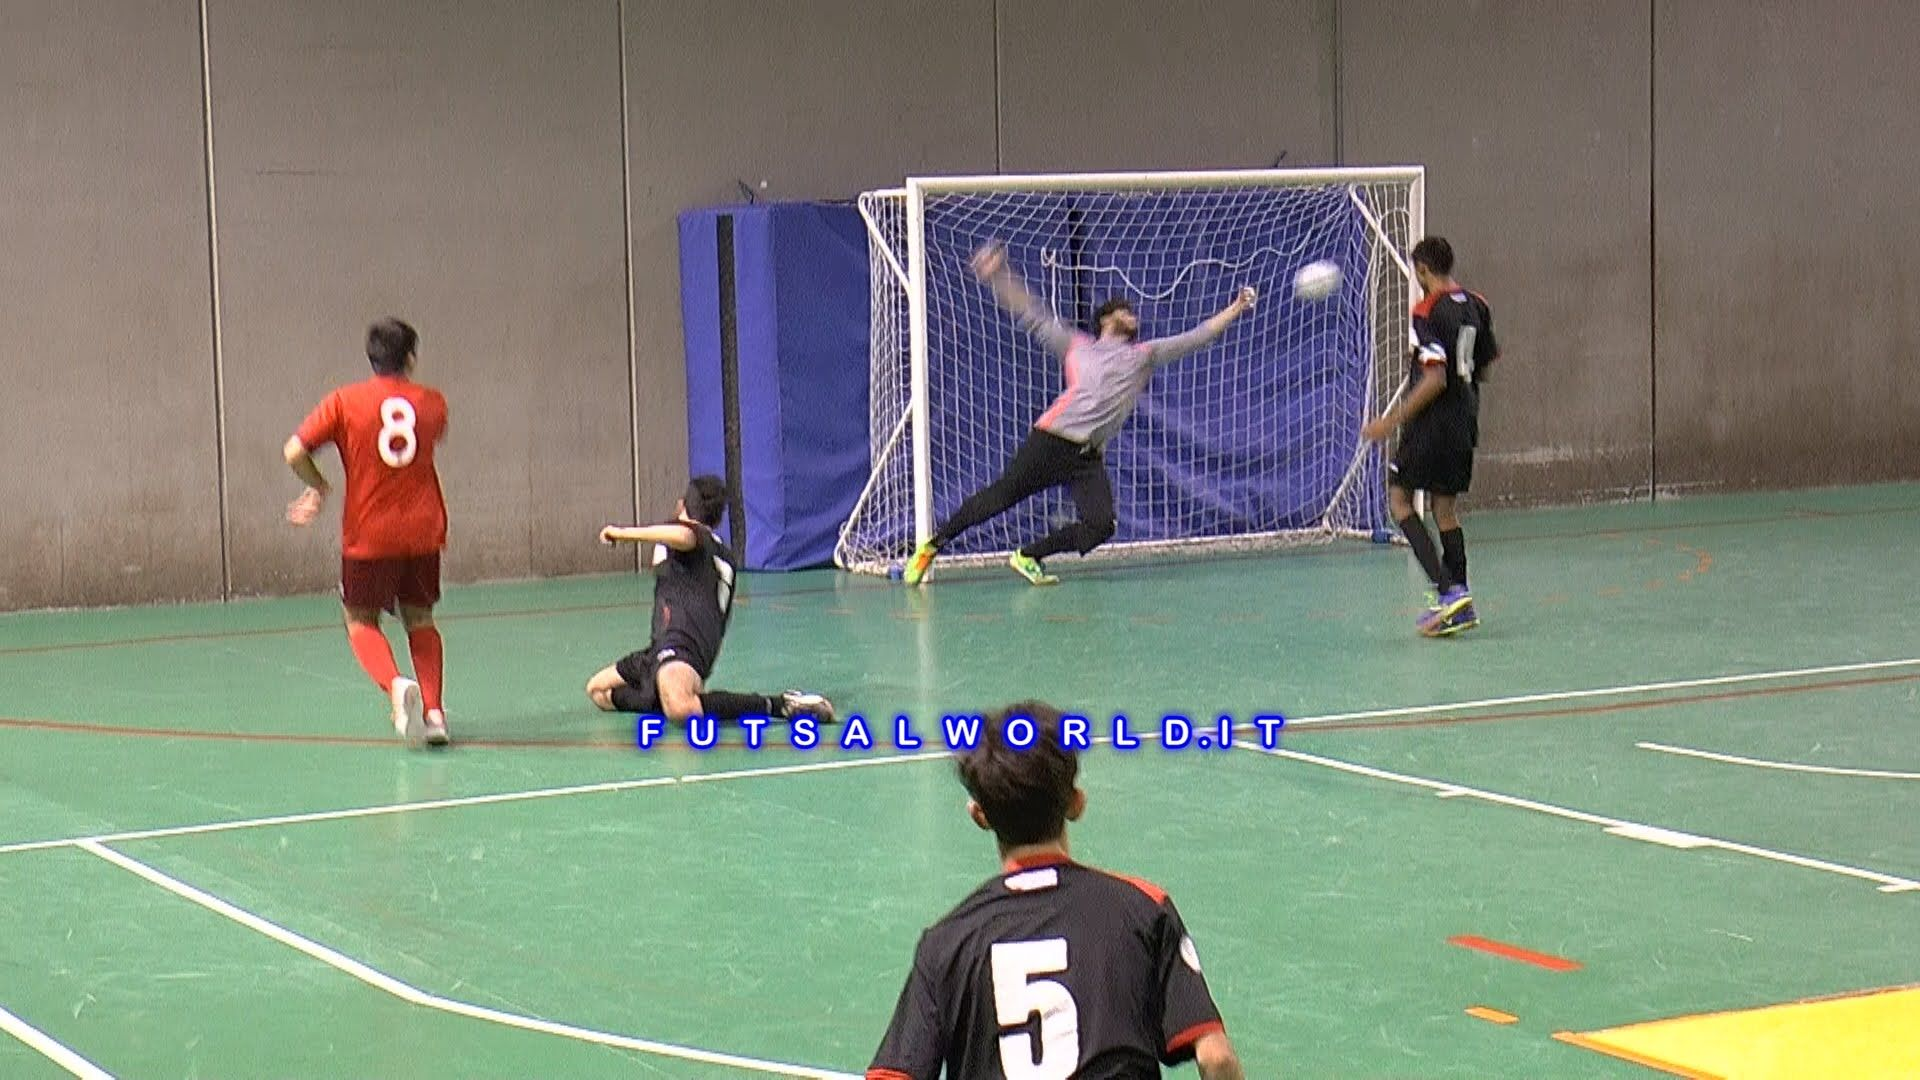 9/1/16 Saints Pagnano - Cometa ... Juniores , calcio a 5 / futsal